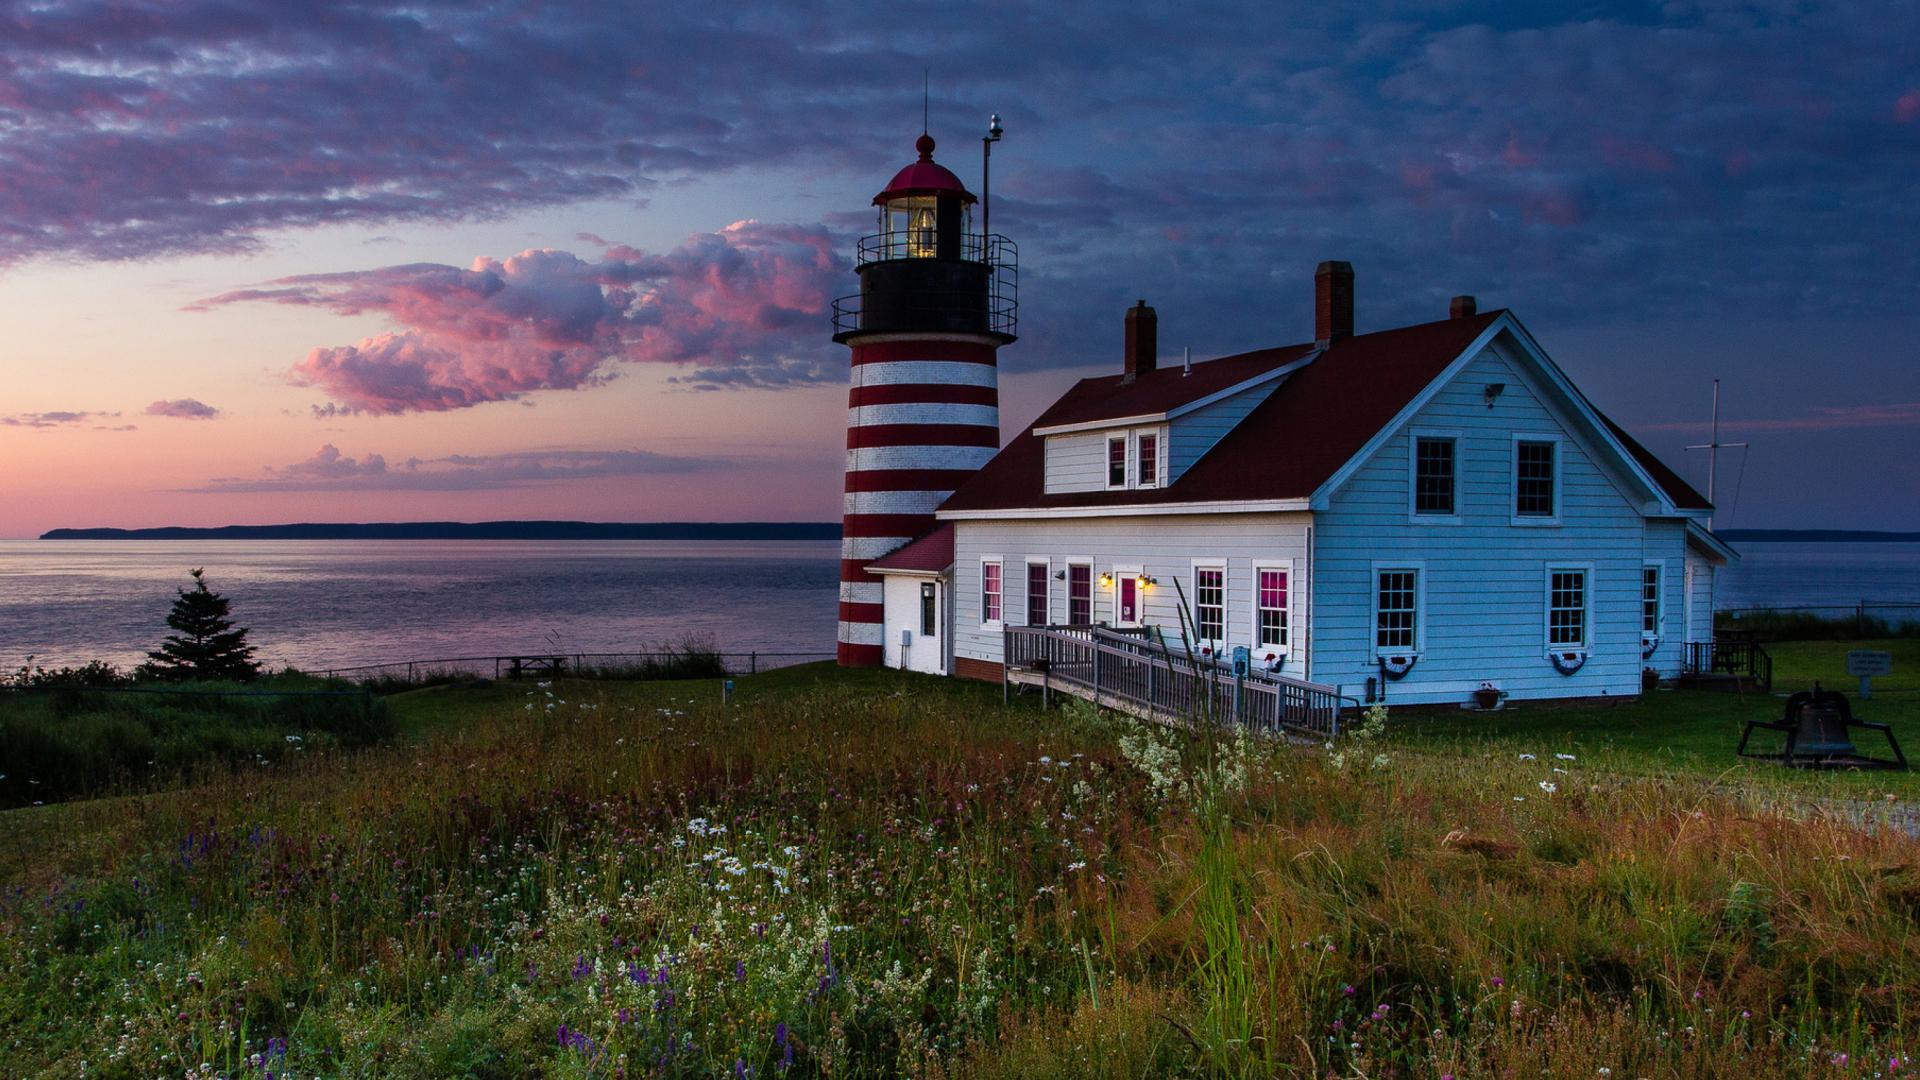 U.S. State Of Maine Lighthouse Wallpaper for Desktop ...